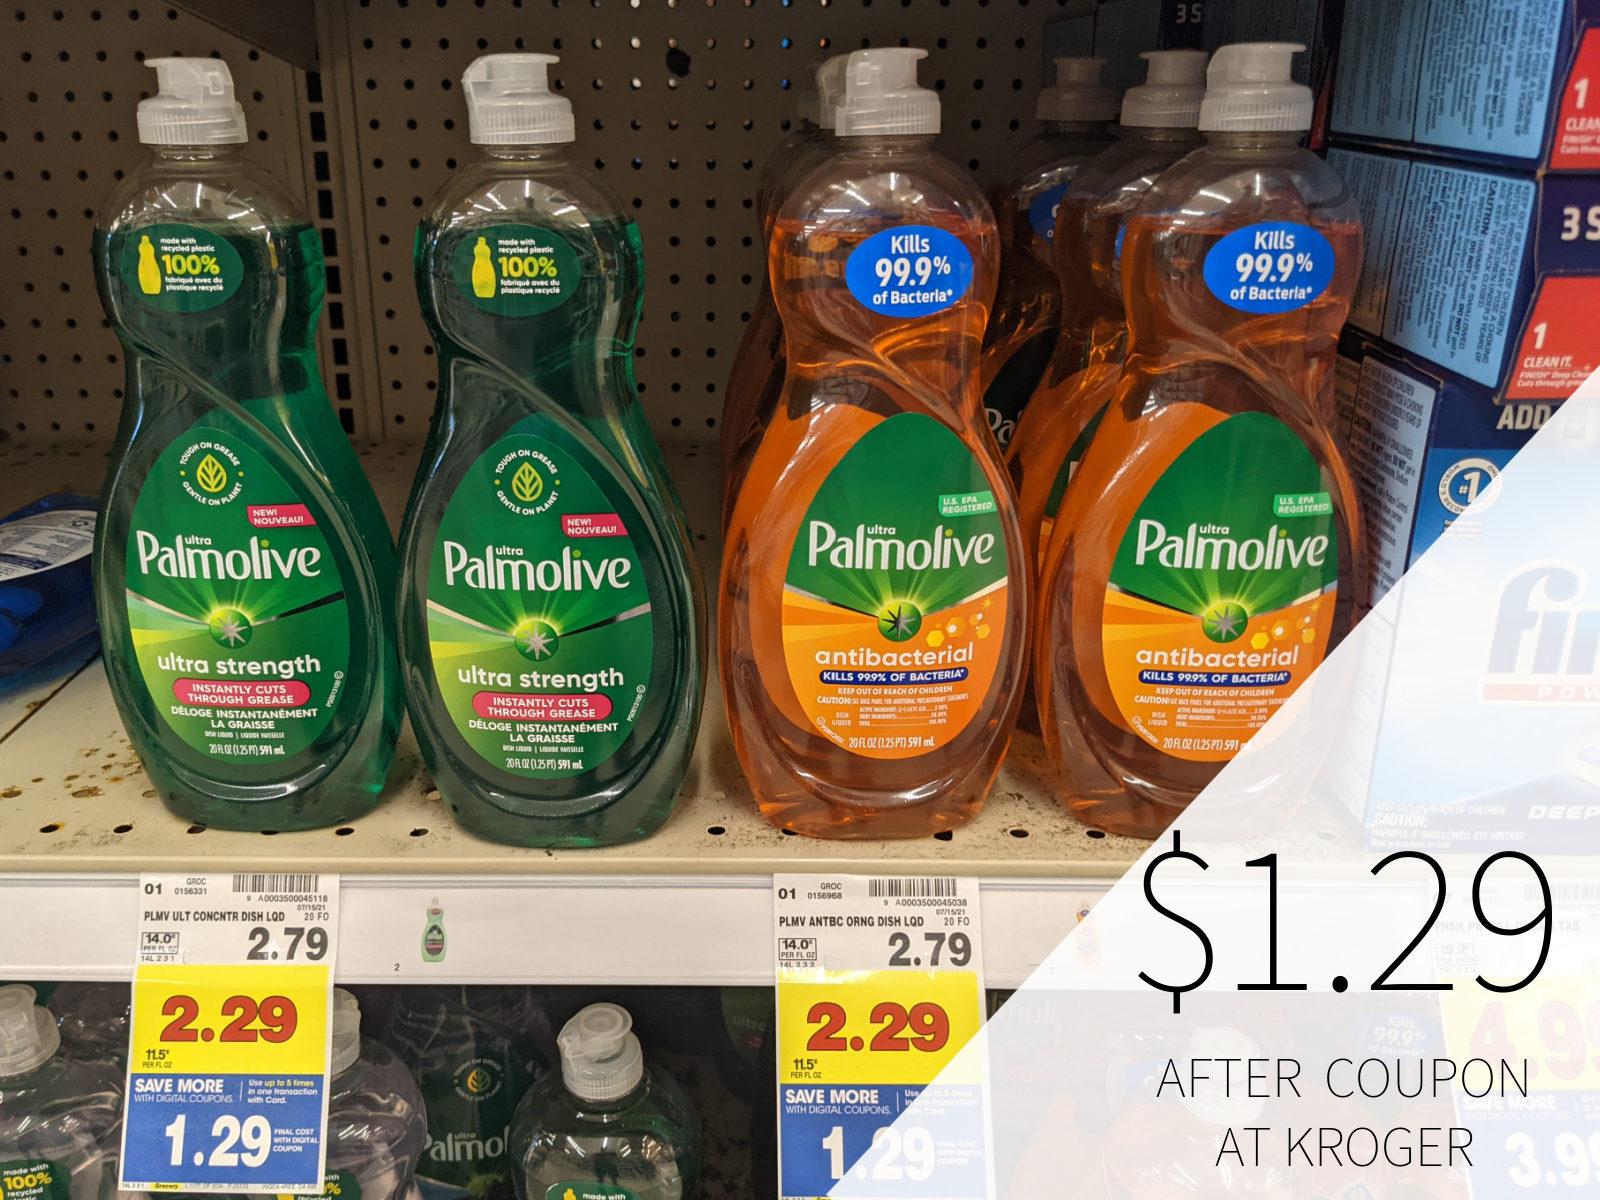 Palmolive Dish Soap Only .54 At Kroger